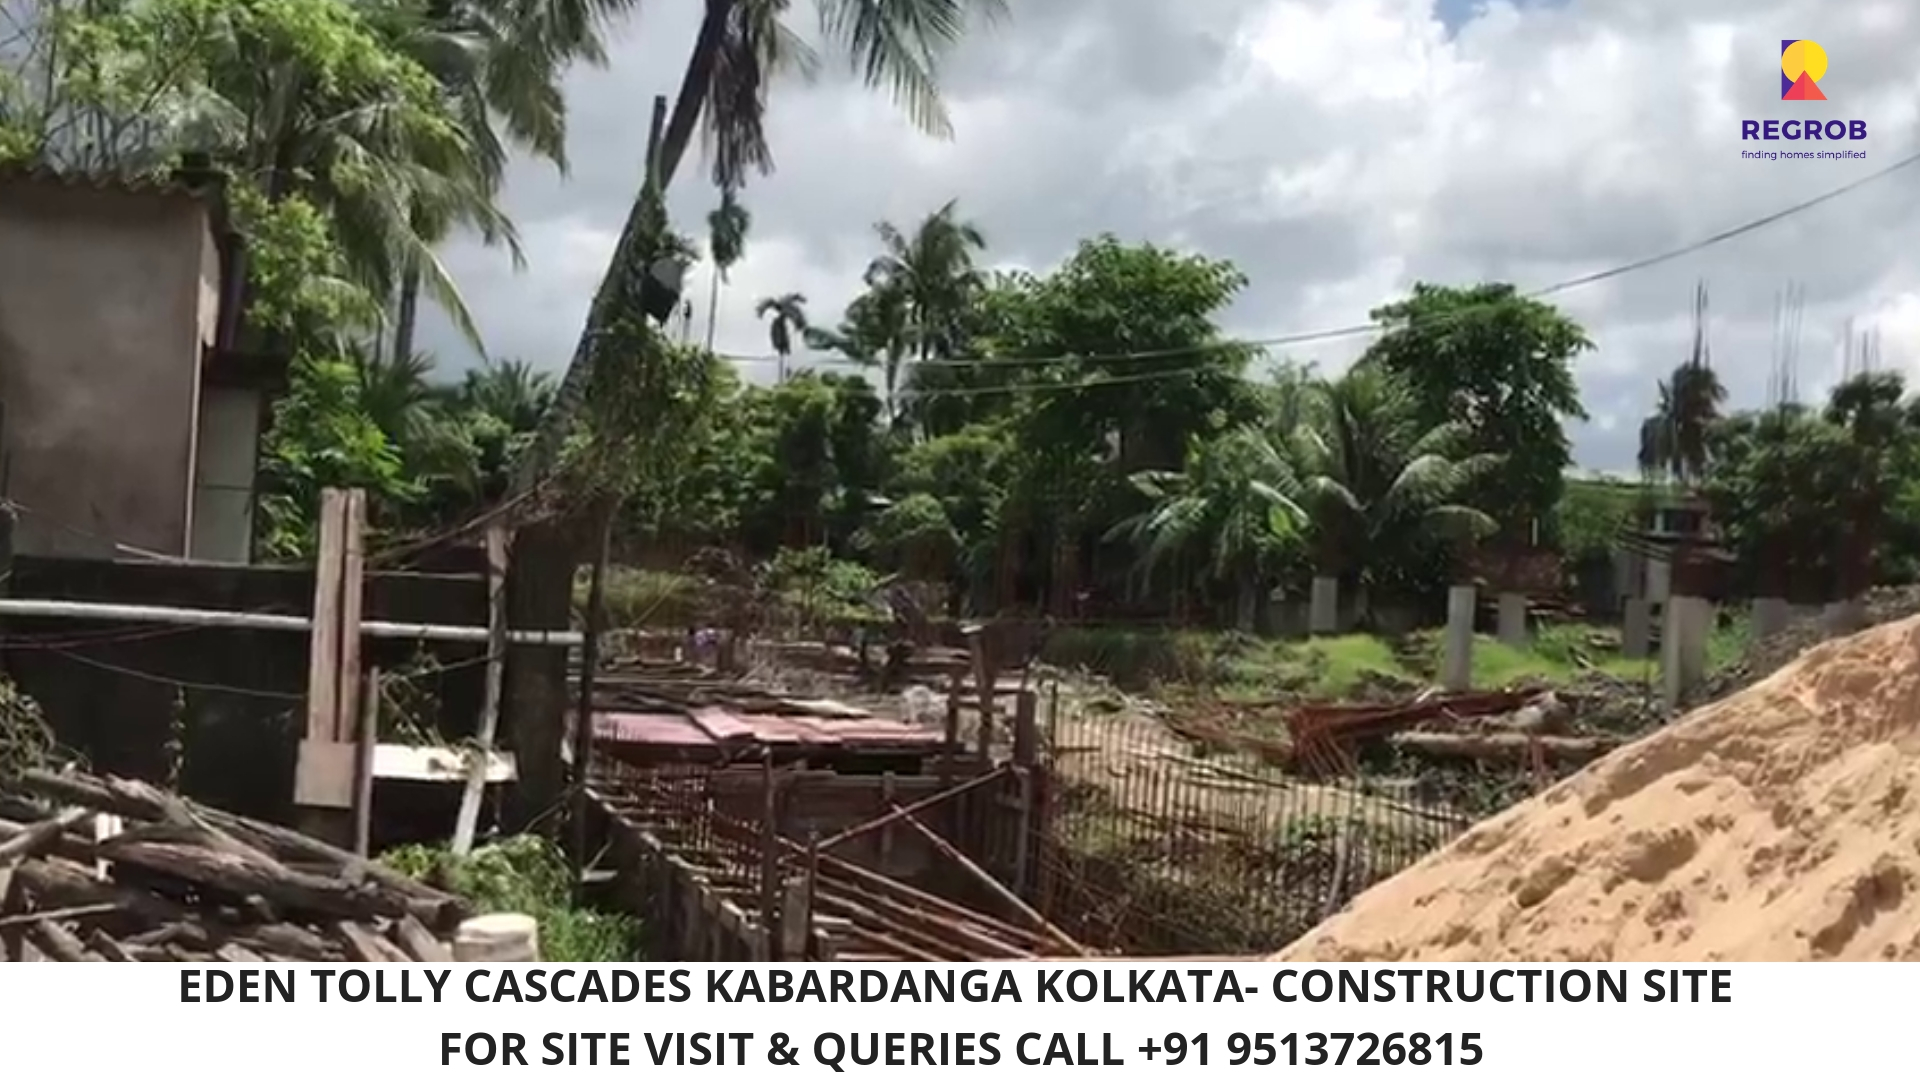 Eden Tolly Cascades Kabardanga Kolkata